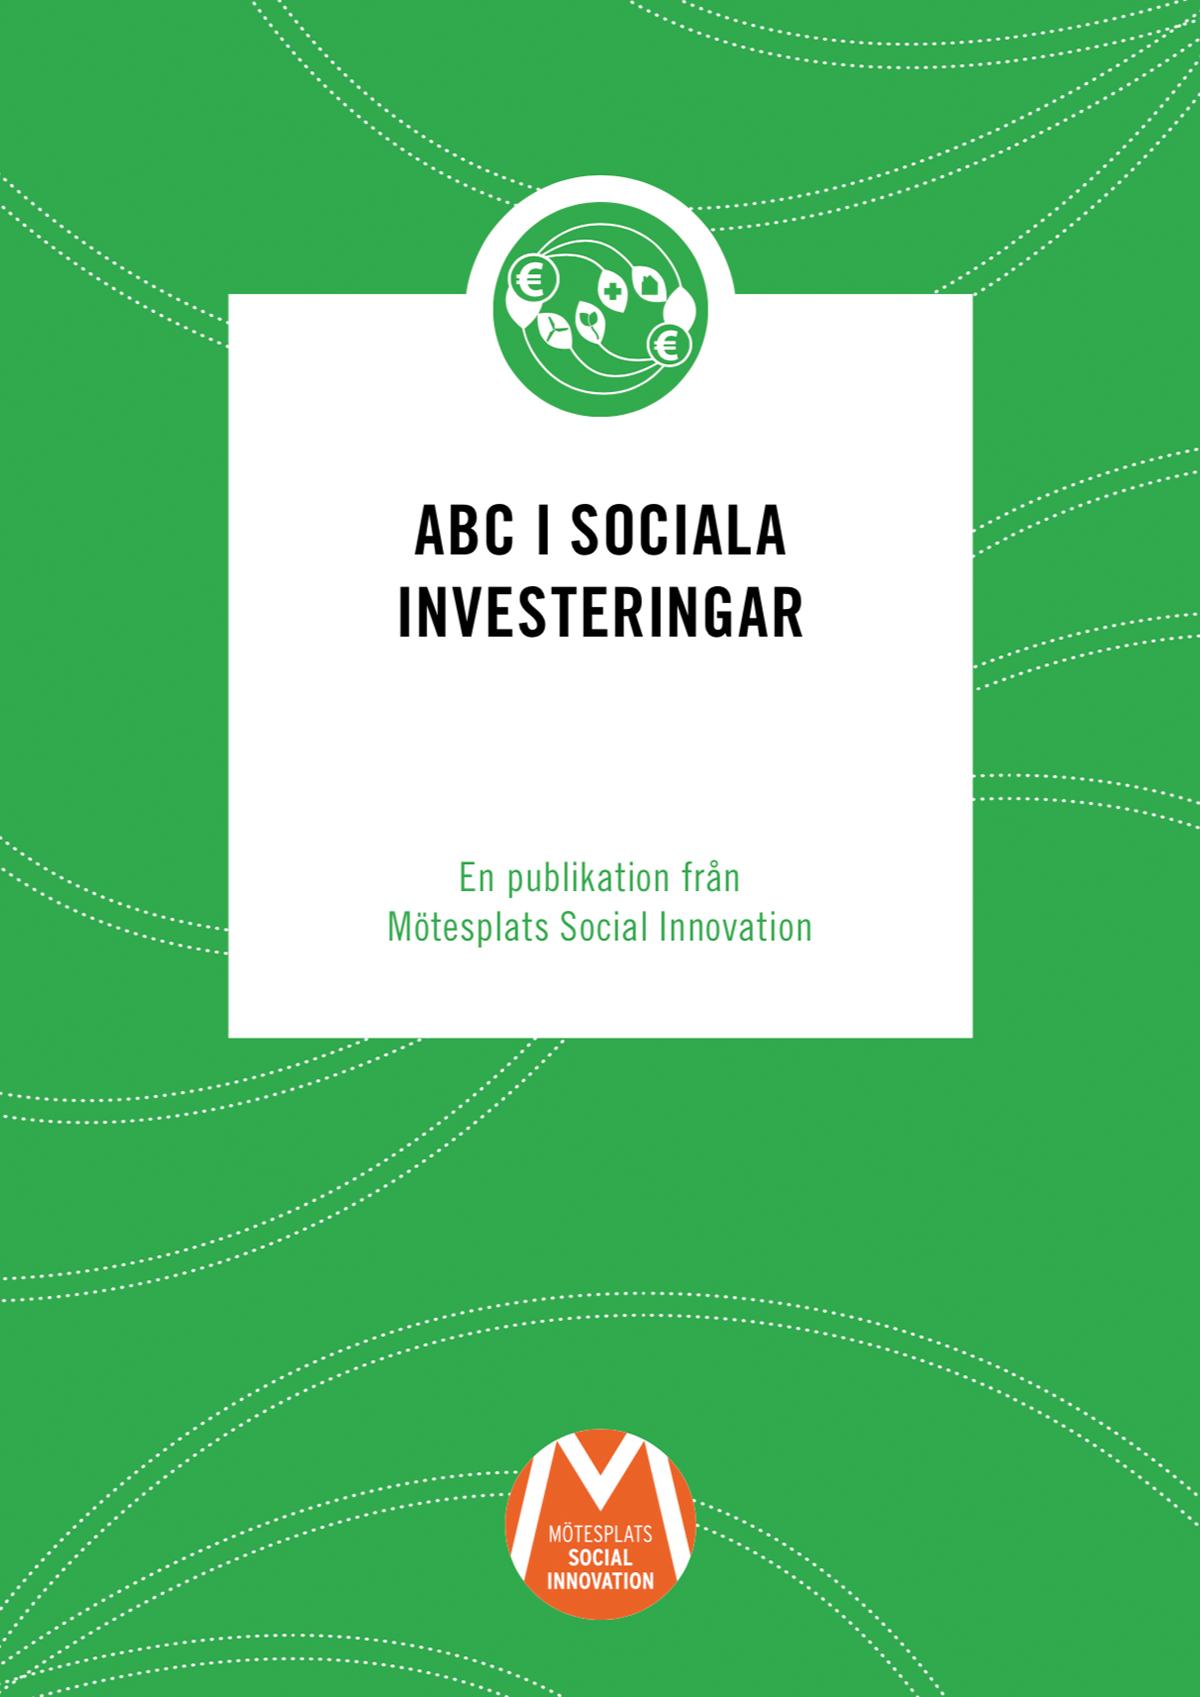 ABC i sociala investeringar (2013)